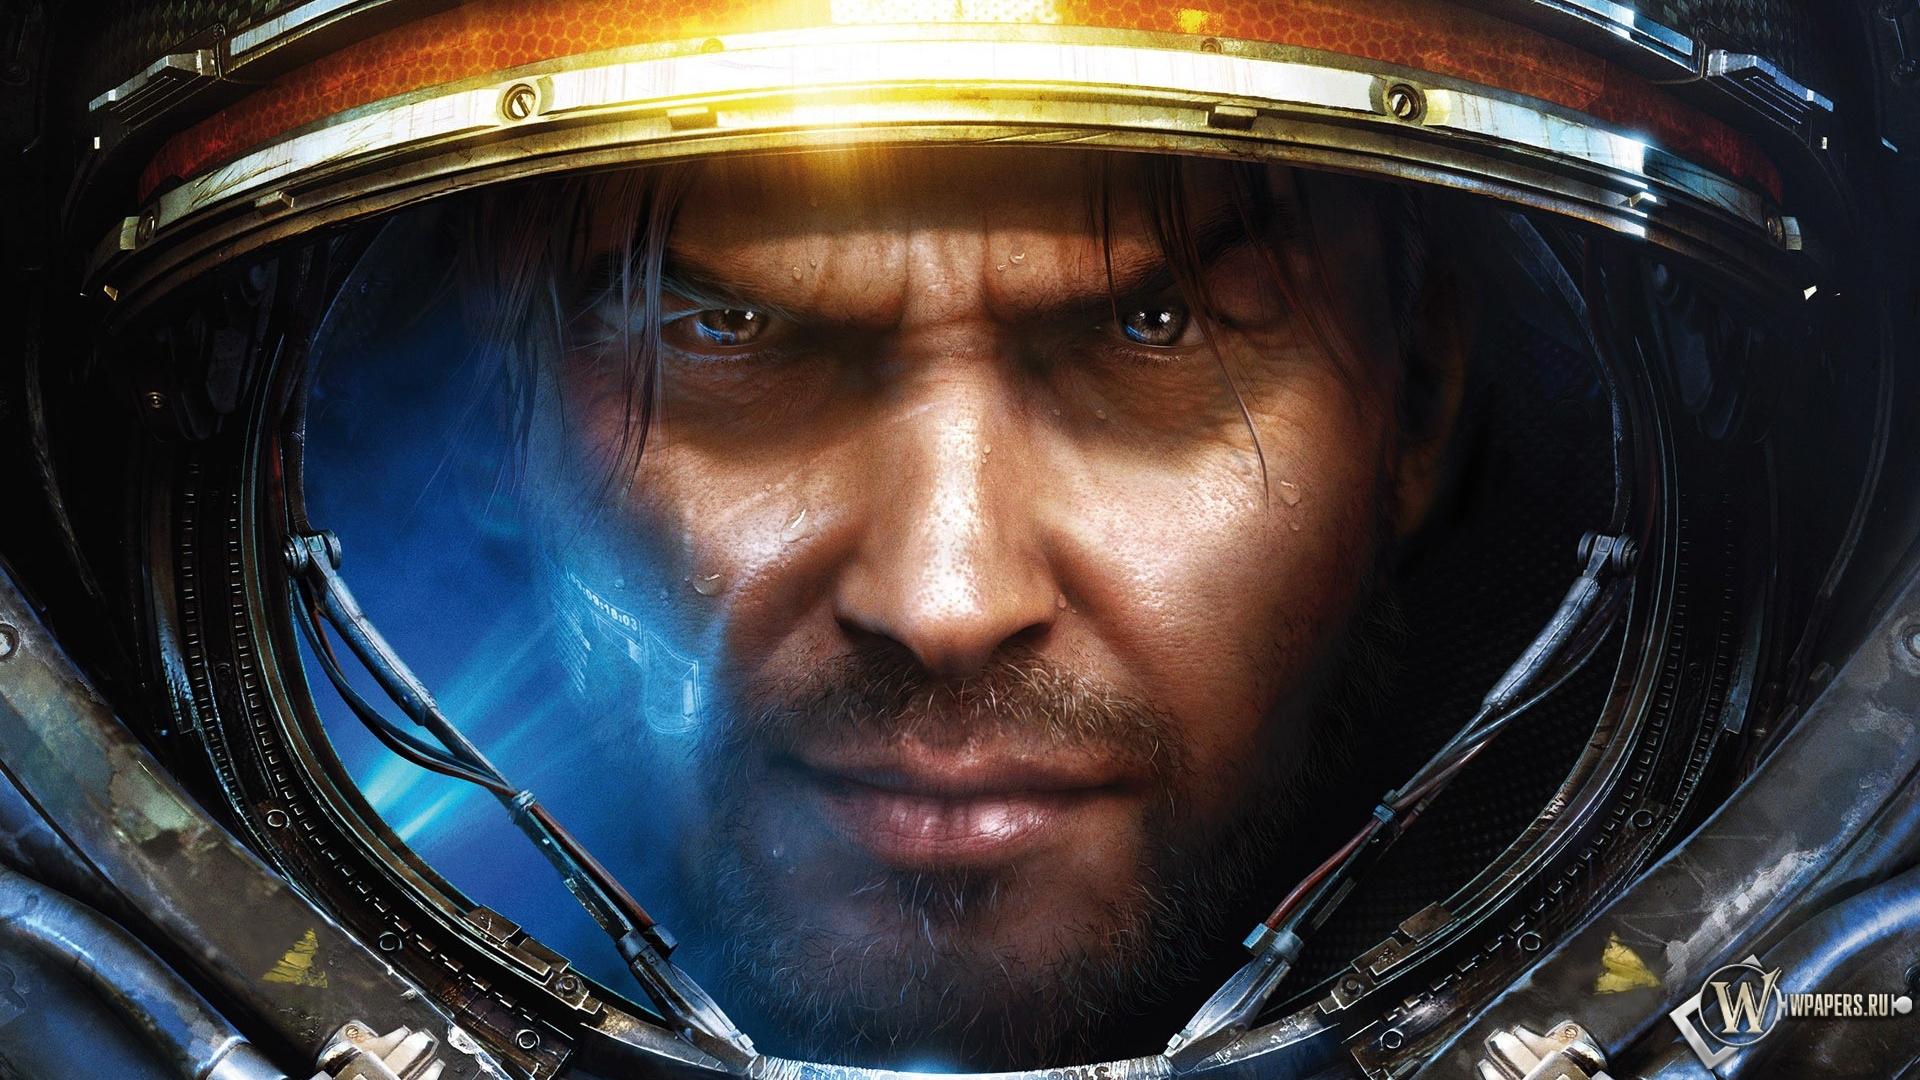 Обои, Star Сraft 2 хуман, Лицо, Старкрафт, StarCraft, Blizzard